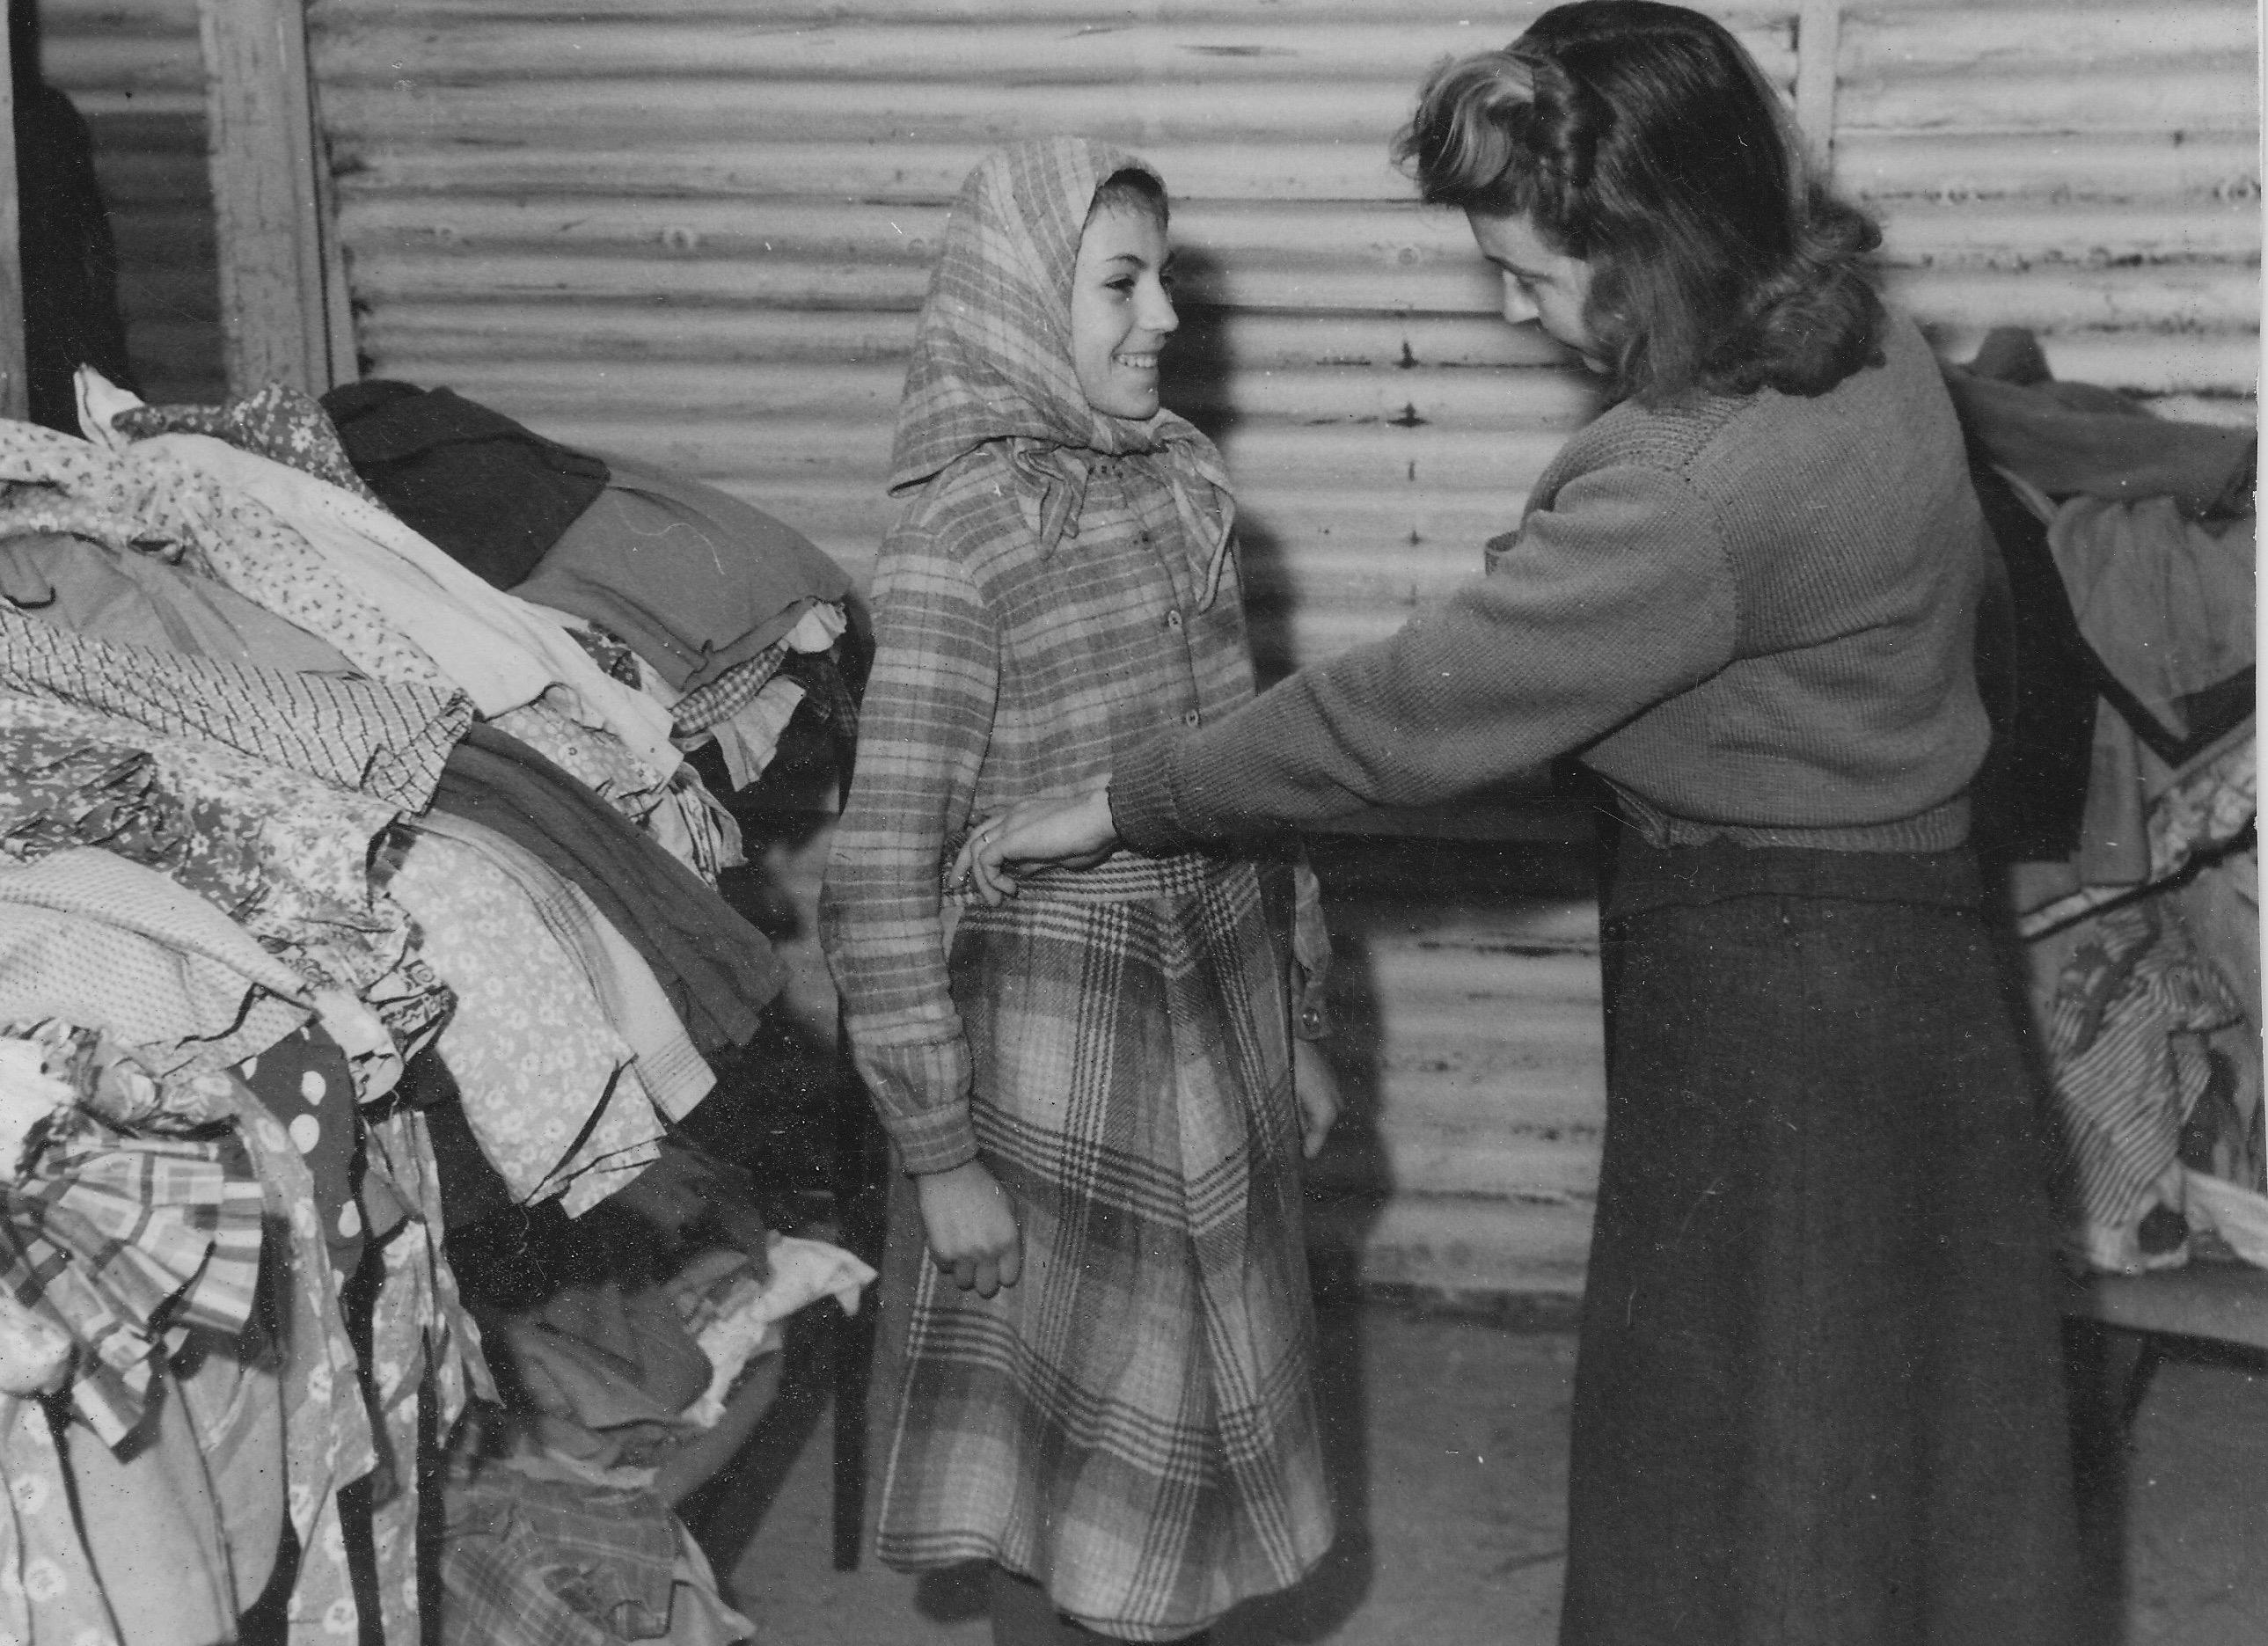 San Sabba clothing, German school girl receives a skirt 1950-51